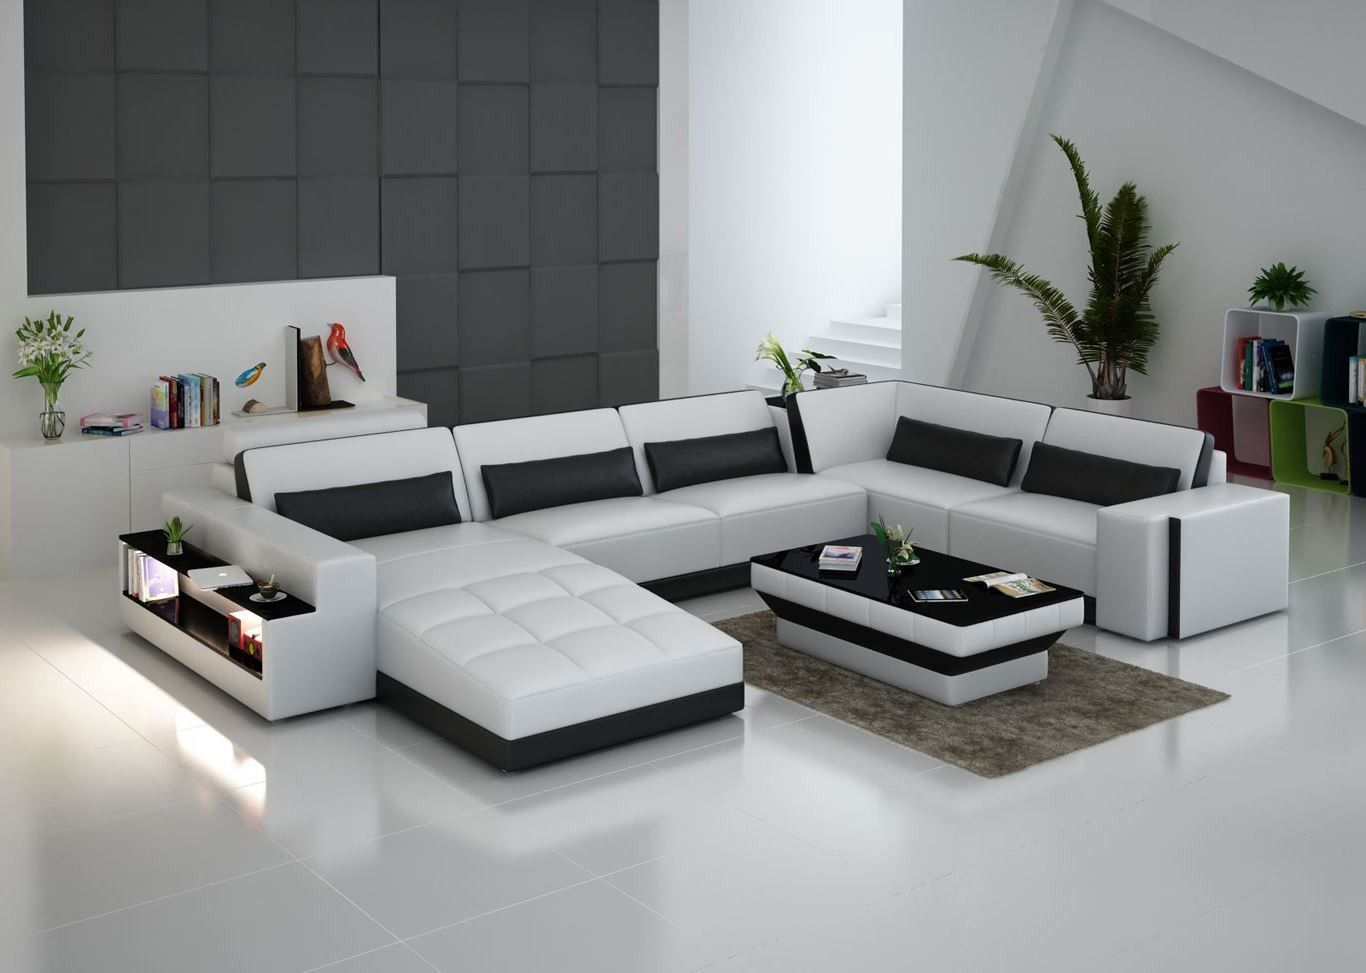 La Ii Contemporary Sofa Design Modern Sofa Sectional Modern Living Room Set